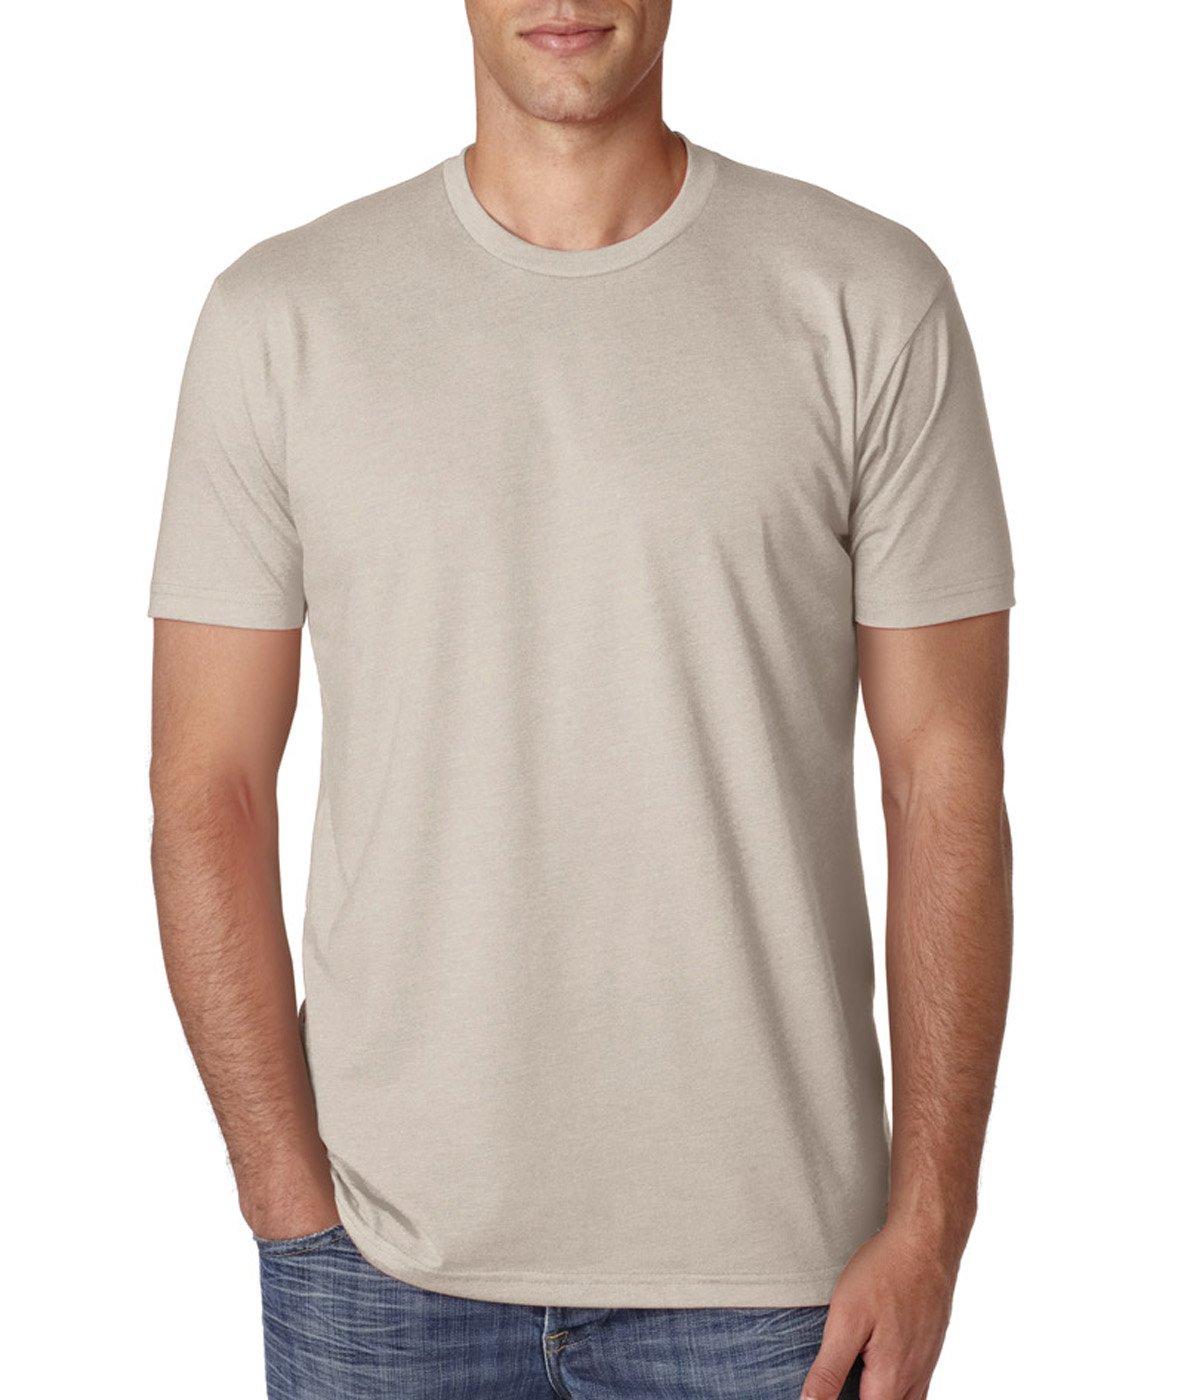 Next Level Apparel メンズ CVC クルーネック ジャージ Tシャツ B07D1BDSZM XX-Large|Black + Sand (2 Shirts) Black + Sand (2 Shirts) XX-Large